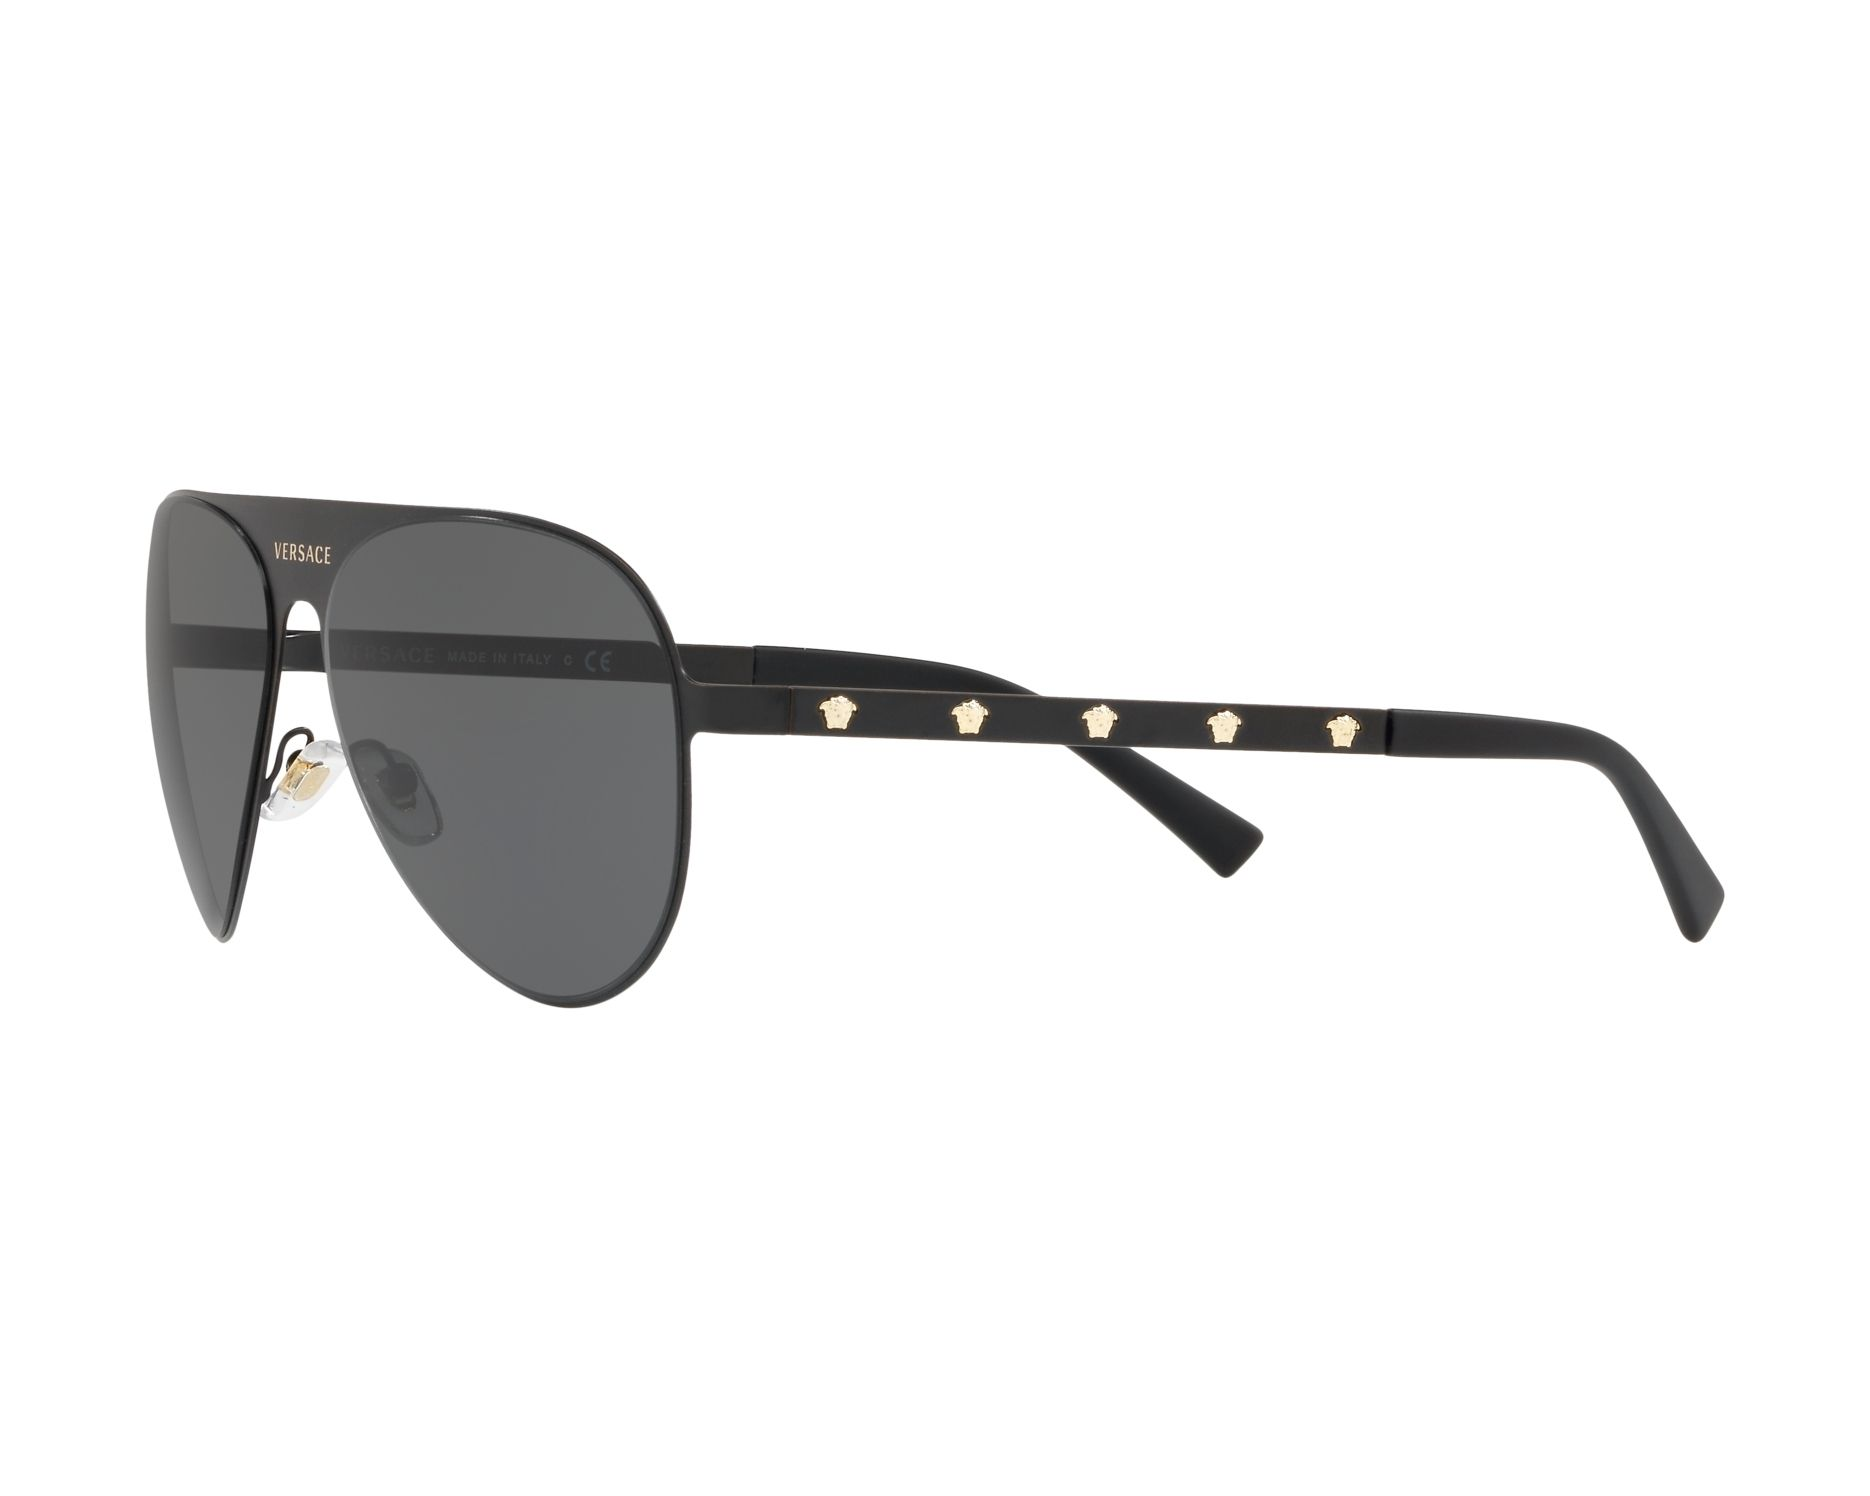 3802c49645e Sunglasses Versace VE-2189 142587 59-14 Black Gold 360 degree view 3